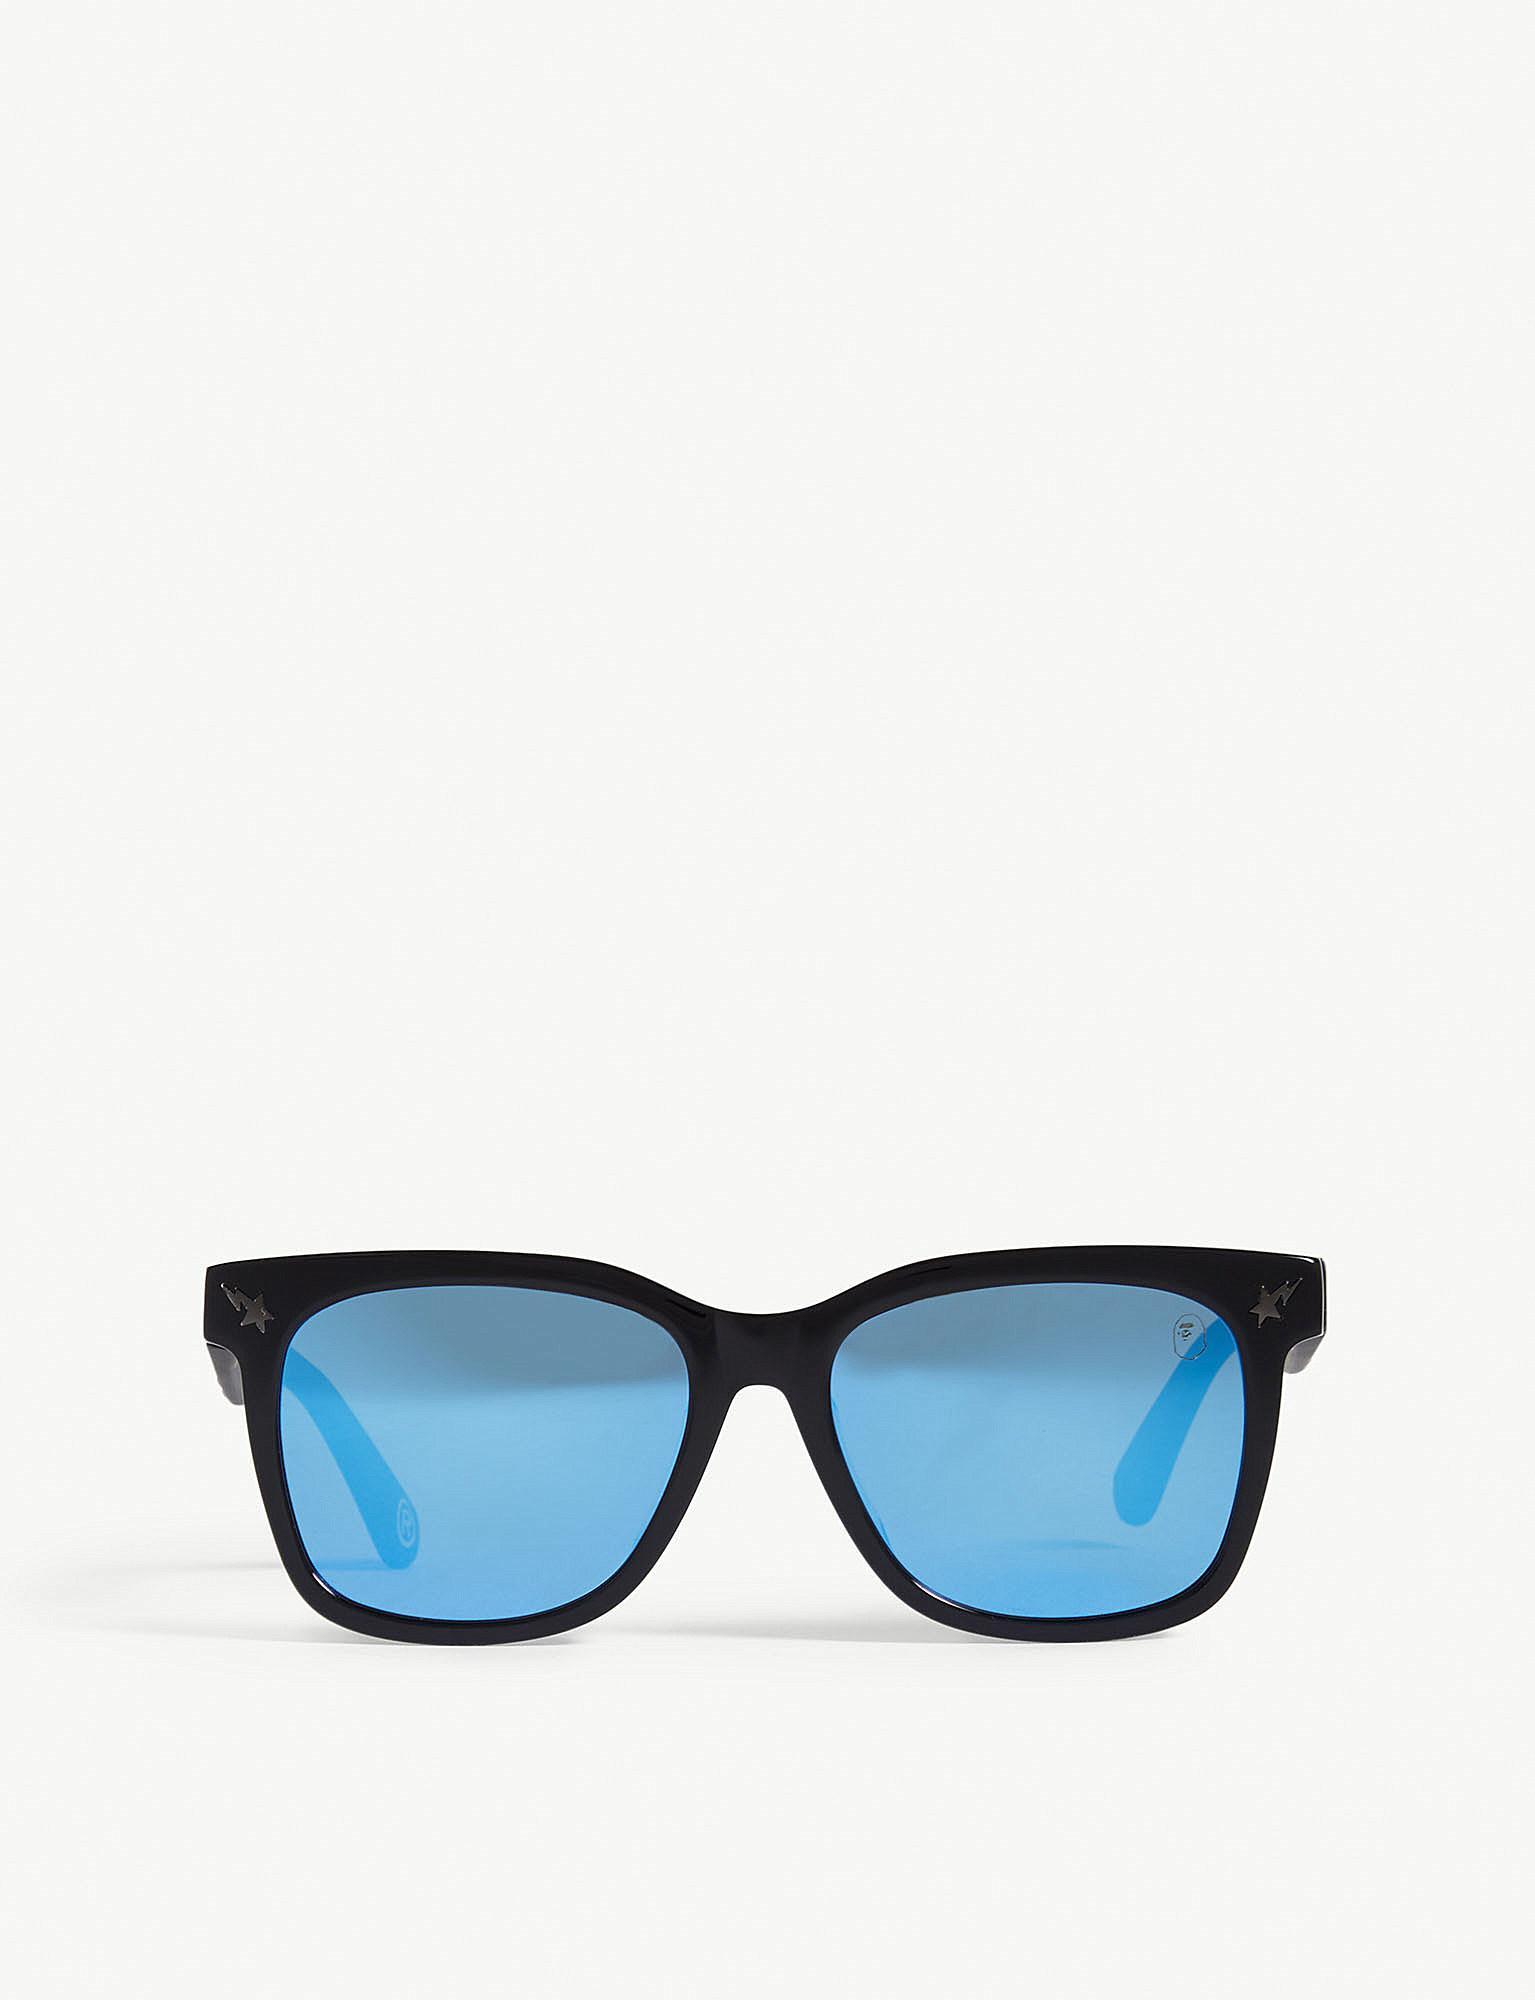 68b89b4392 Lyst - A Bathing Ape Parkas04 Square-frame Sunglasses in Blue for Men